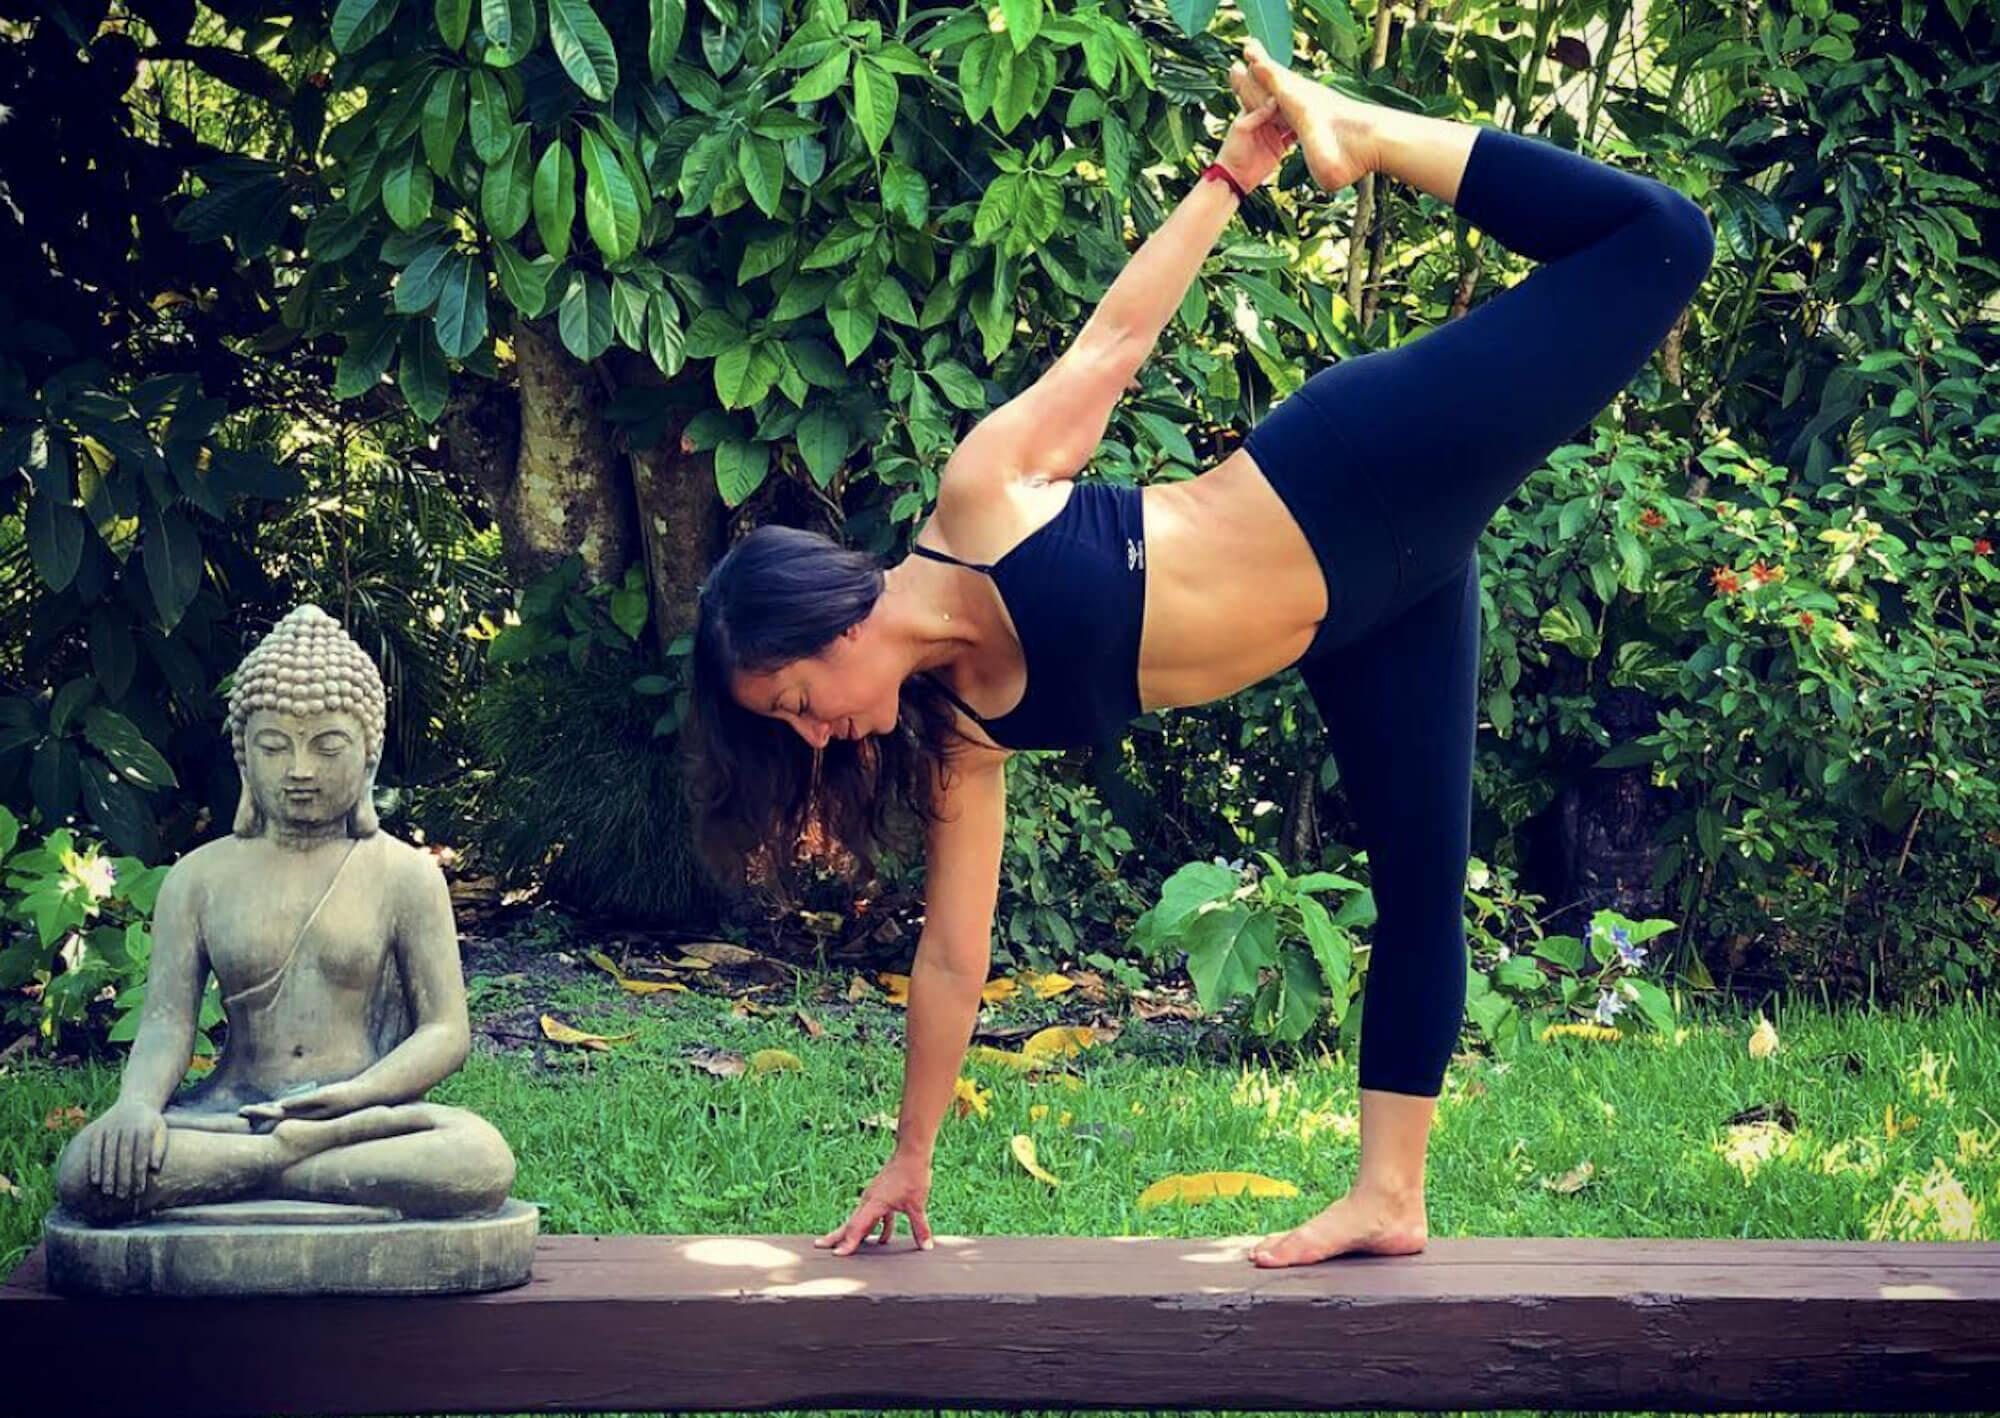 gabriela estrada INSTAGRAM PROFILES: #yoga